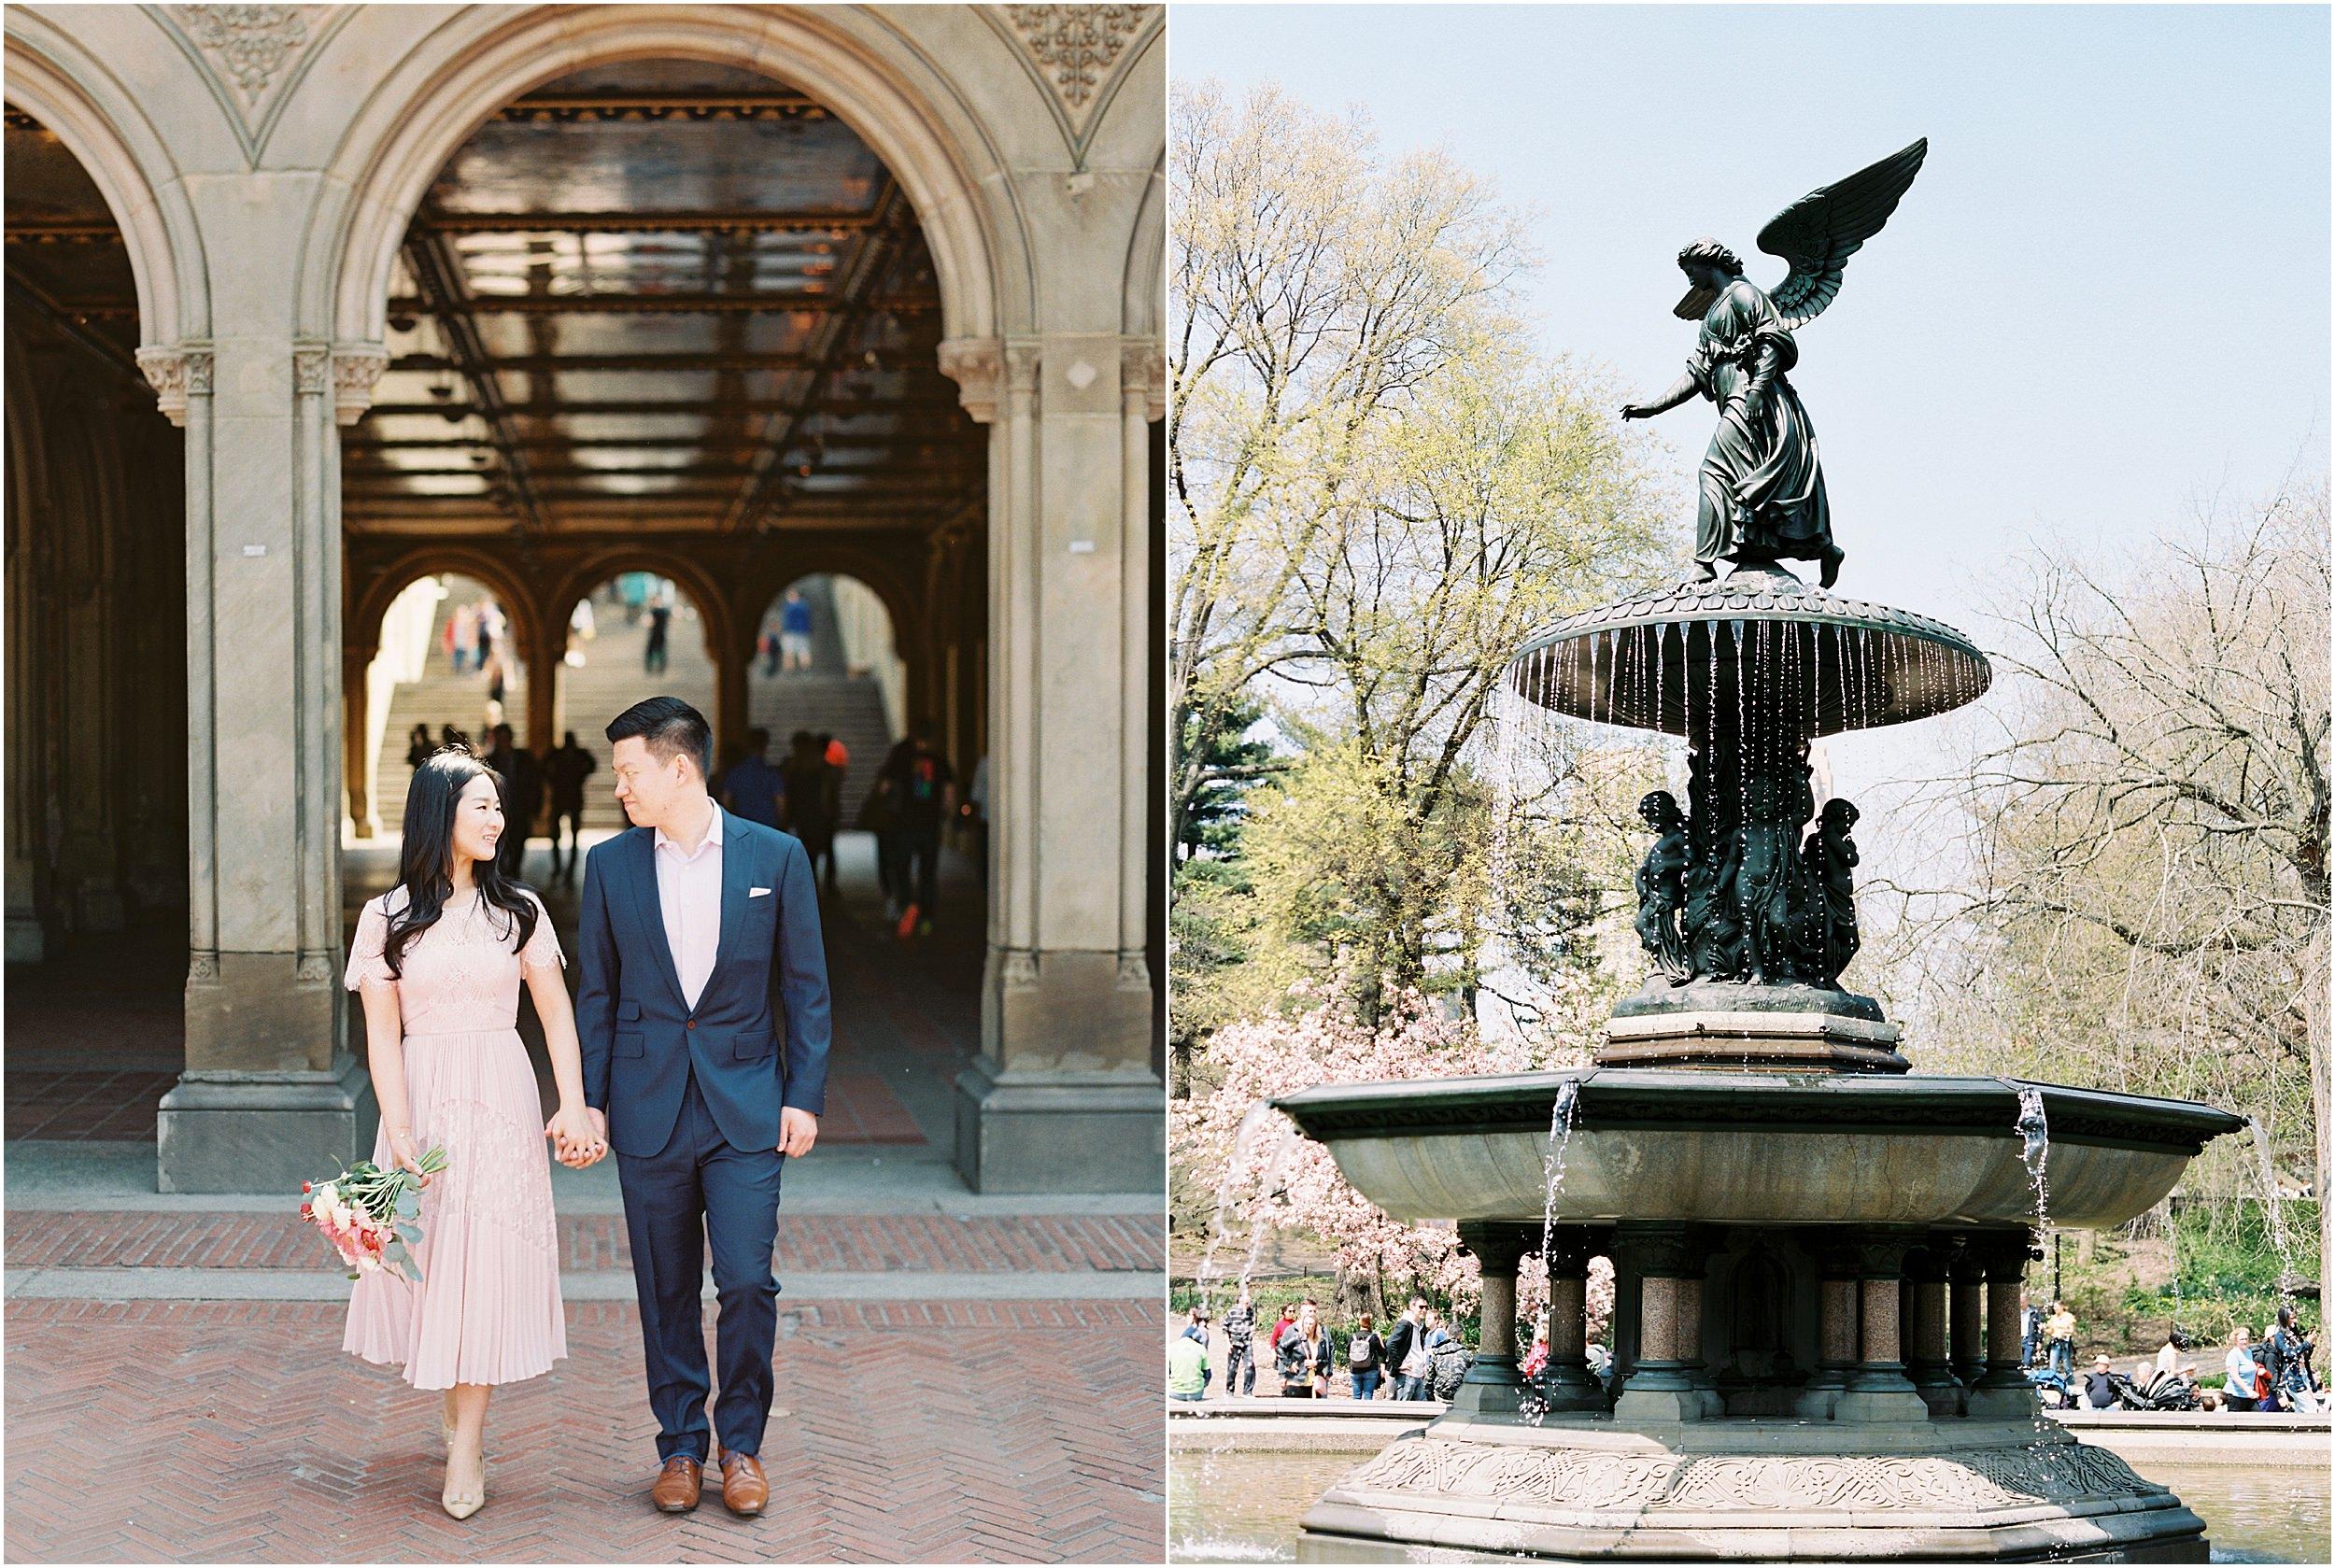 JeremiahRachelPhotography_CentralPark_NYC_SpringtimeBloom_EngagementSession0010.JPG